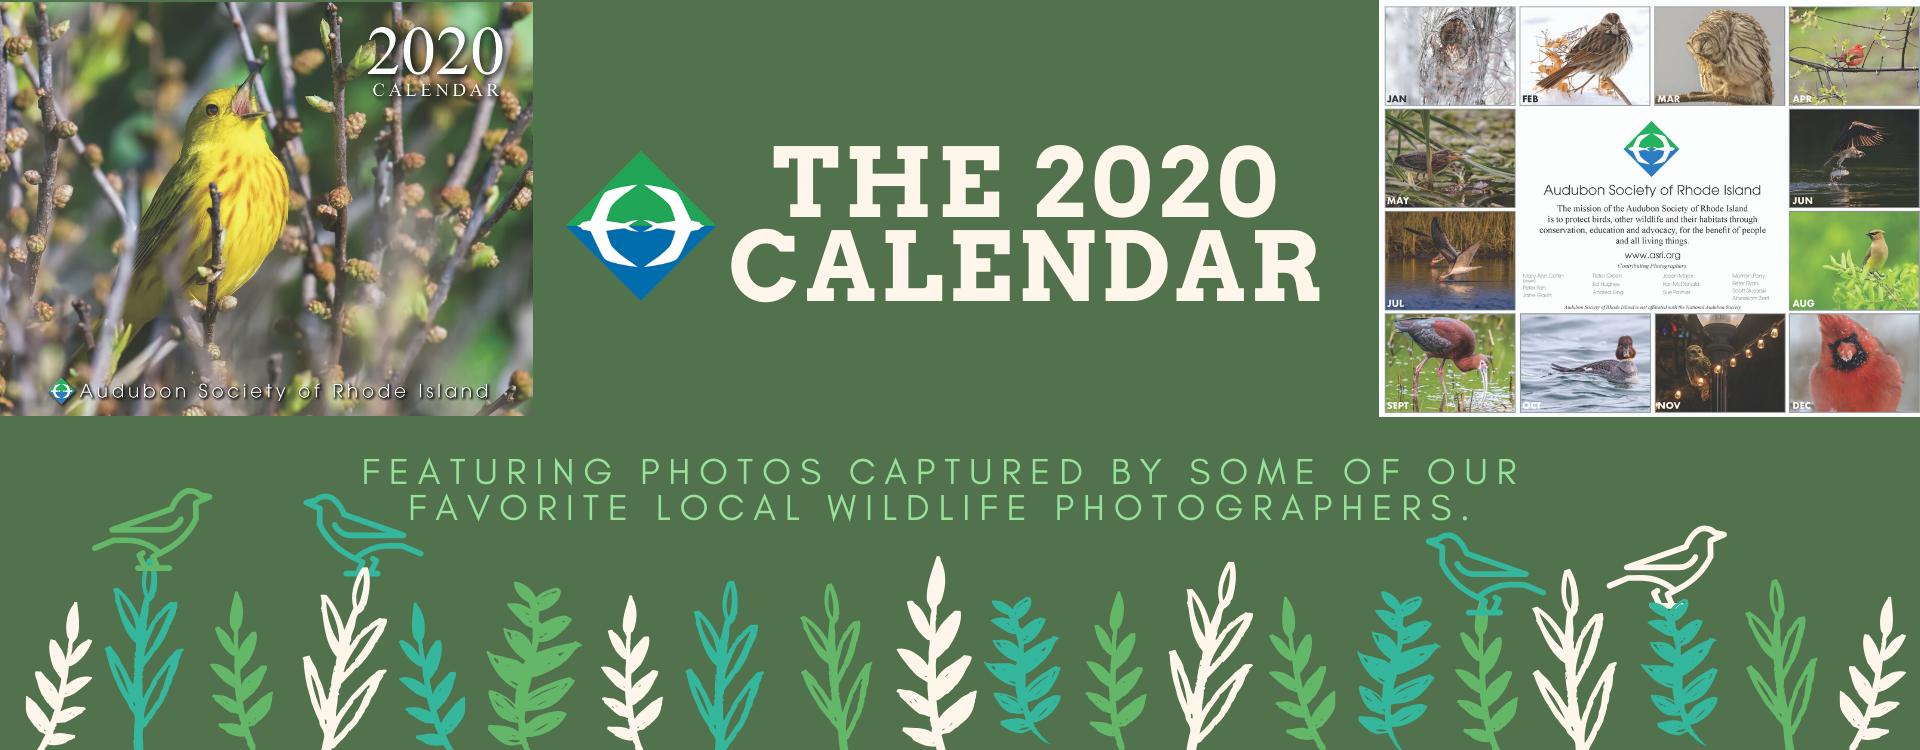 Audubon Society of Rhode island 2020 Calendar Bird Wildlife Photography Birdwatching